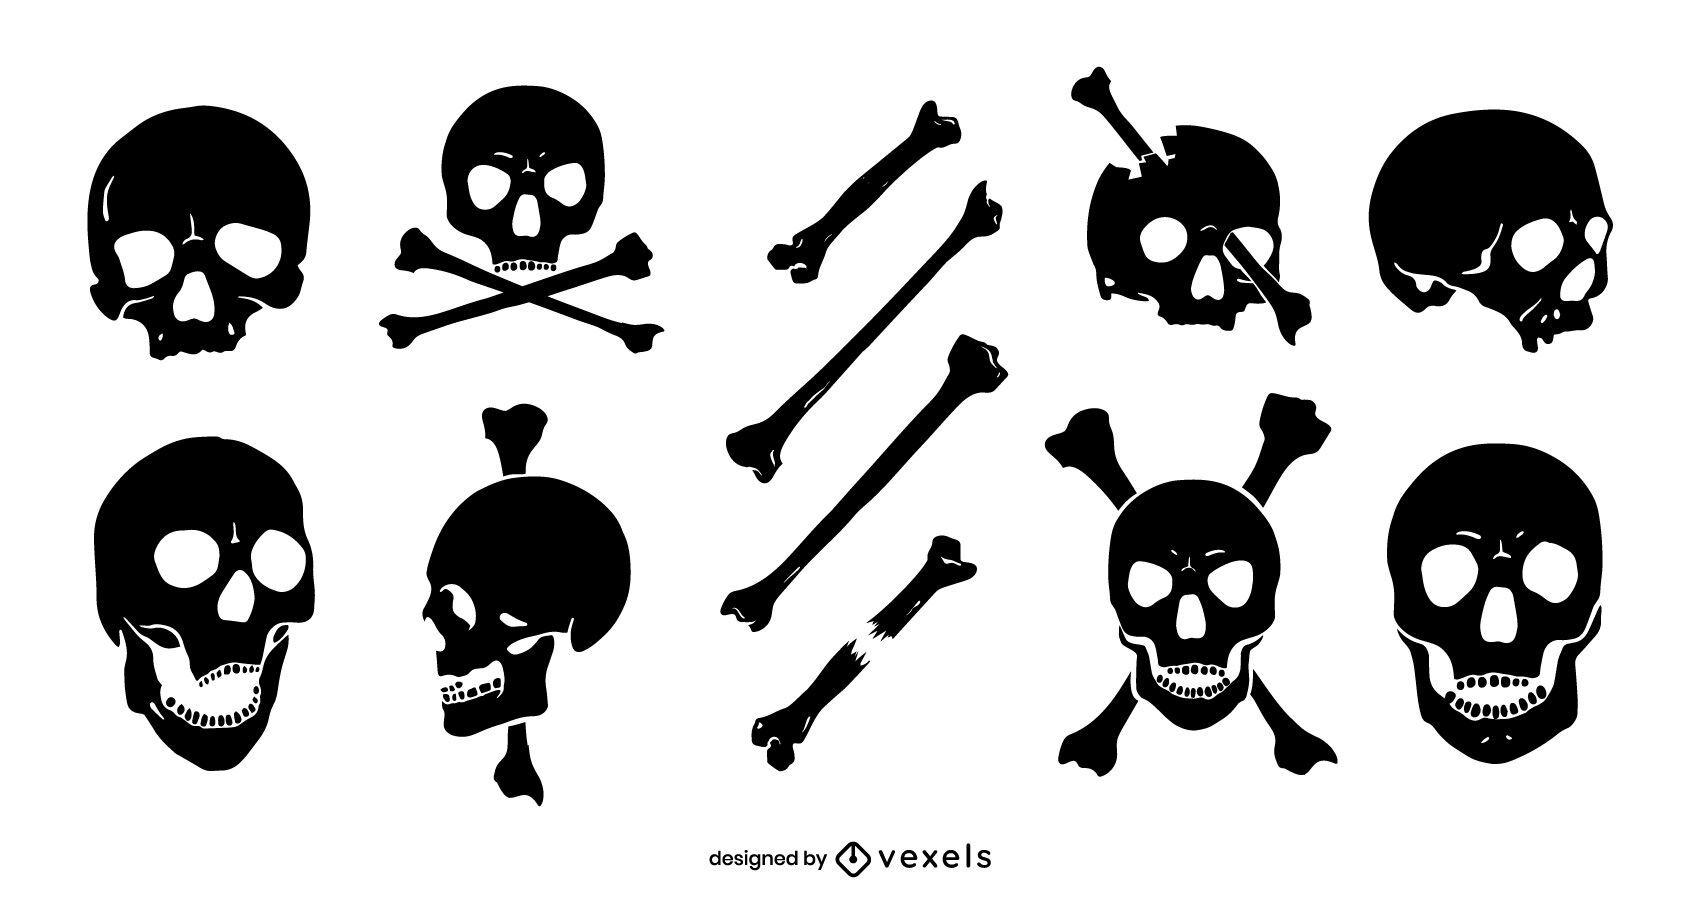 Skulls silhouette set design